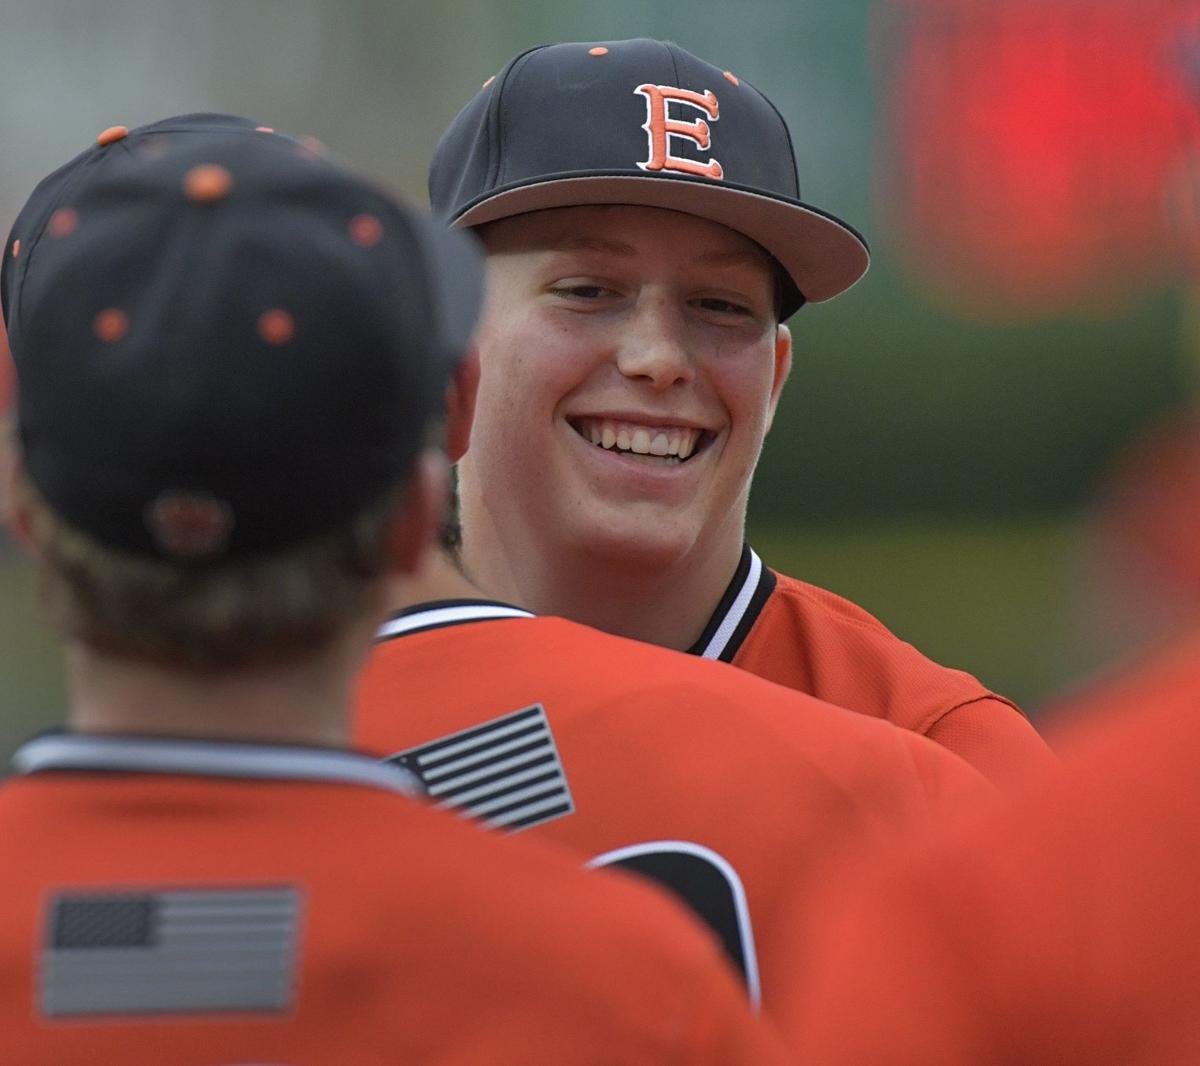 Edwardsville defeats Belleville West in 4A Bloomington Sectional Semifinal baseball